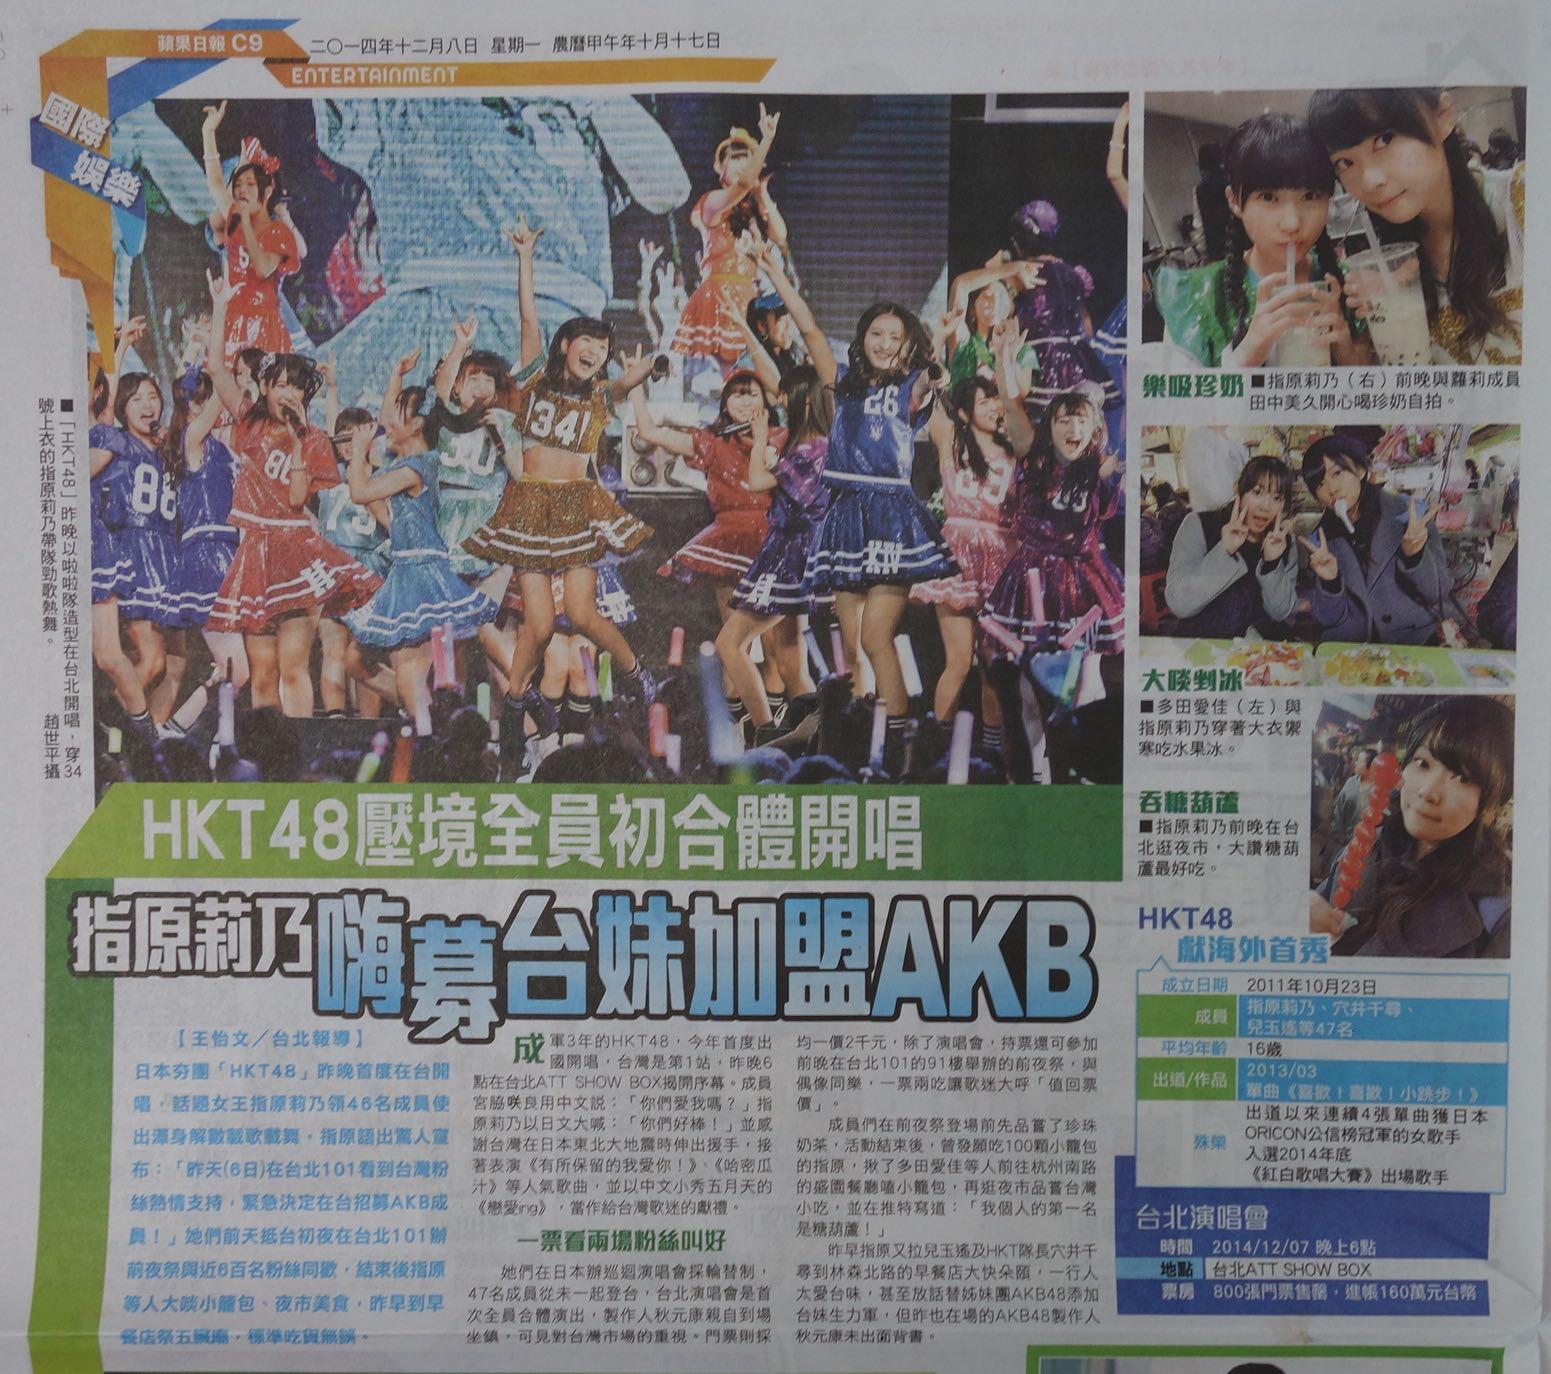 HKT48壓境全員初合體開唱 指原莉乃嗨募台妹加盟AKB 20141208